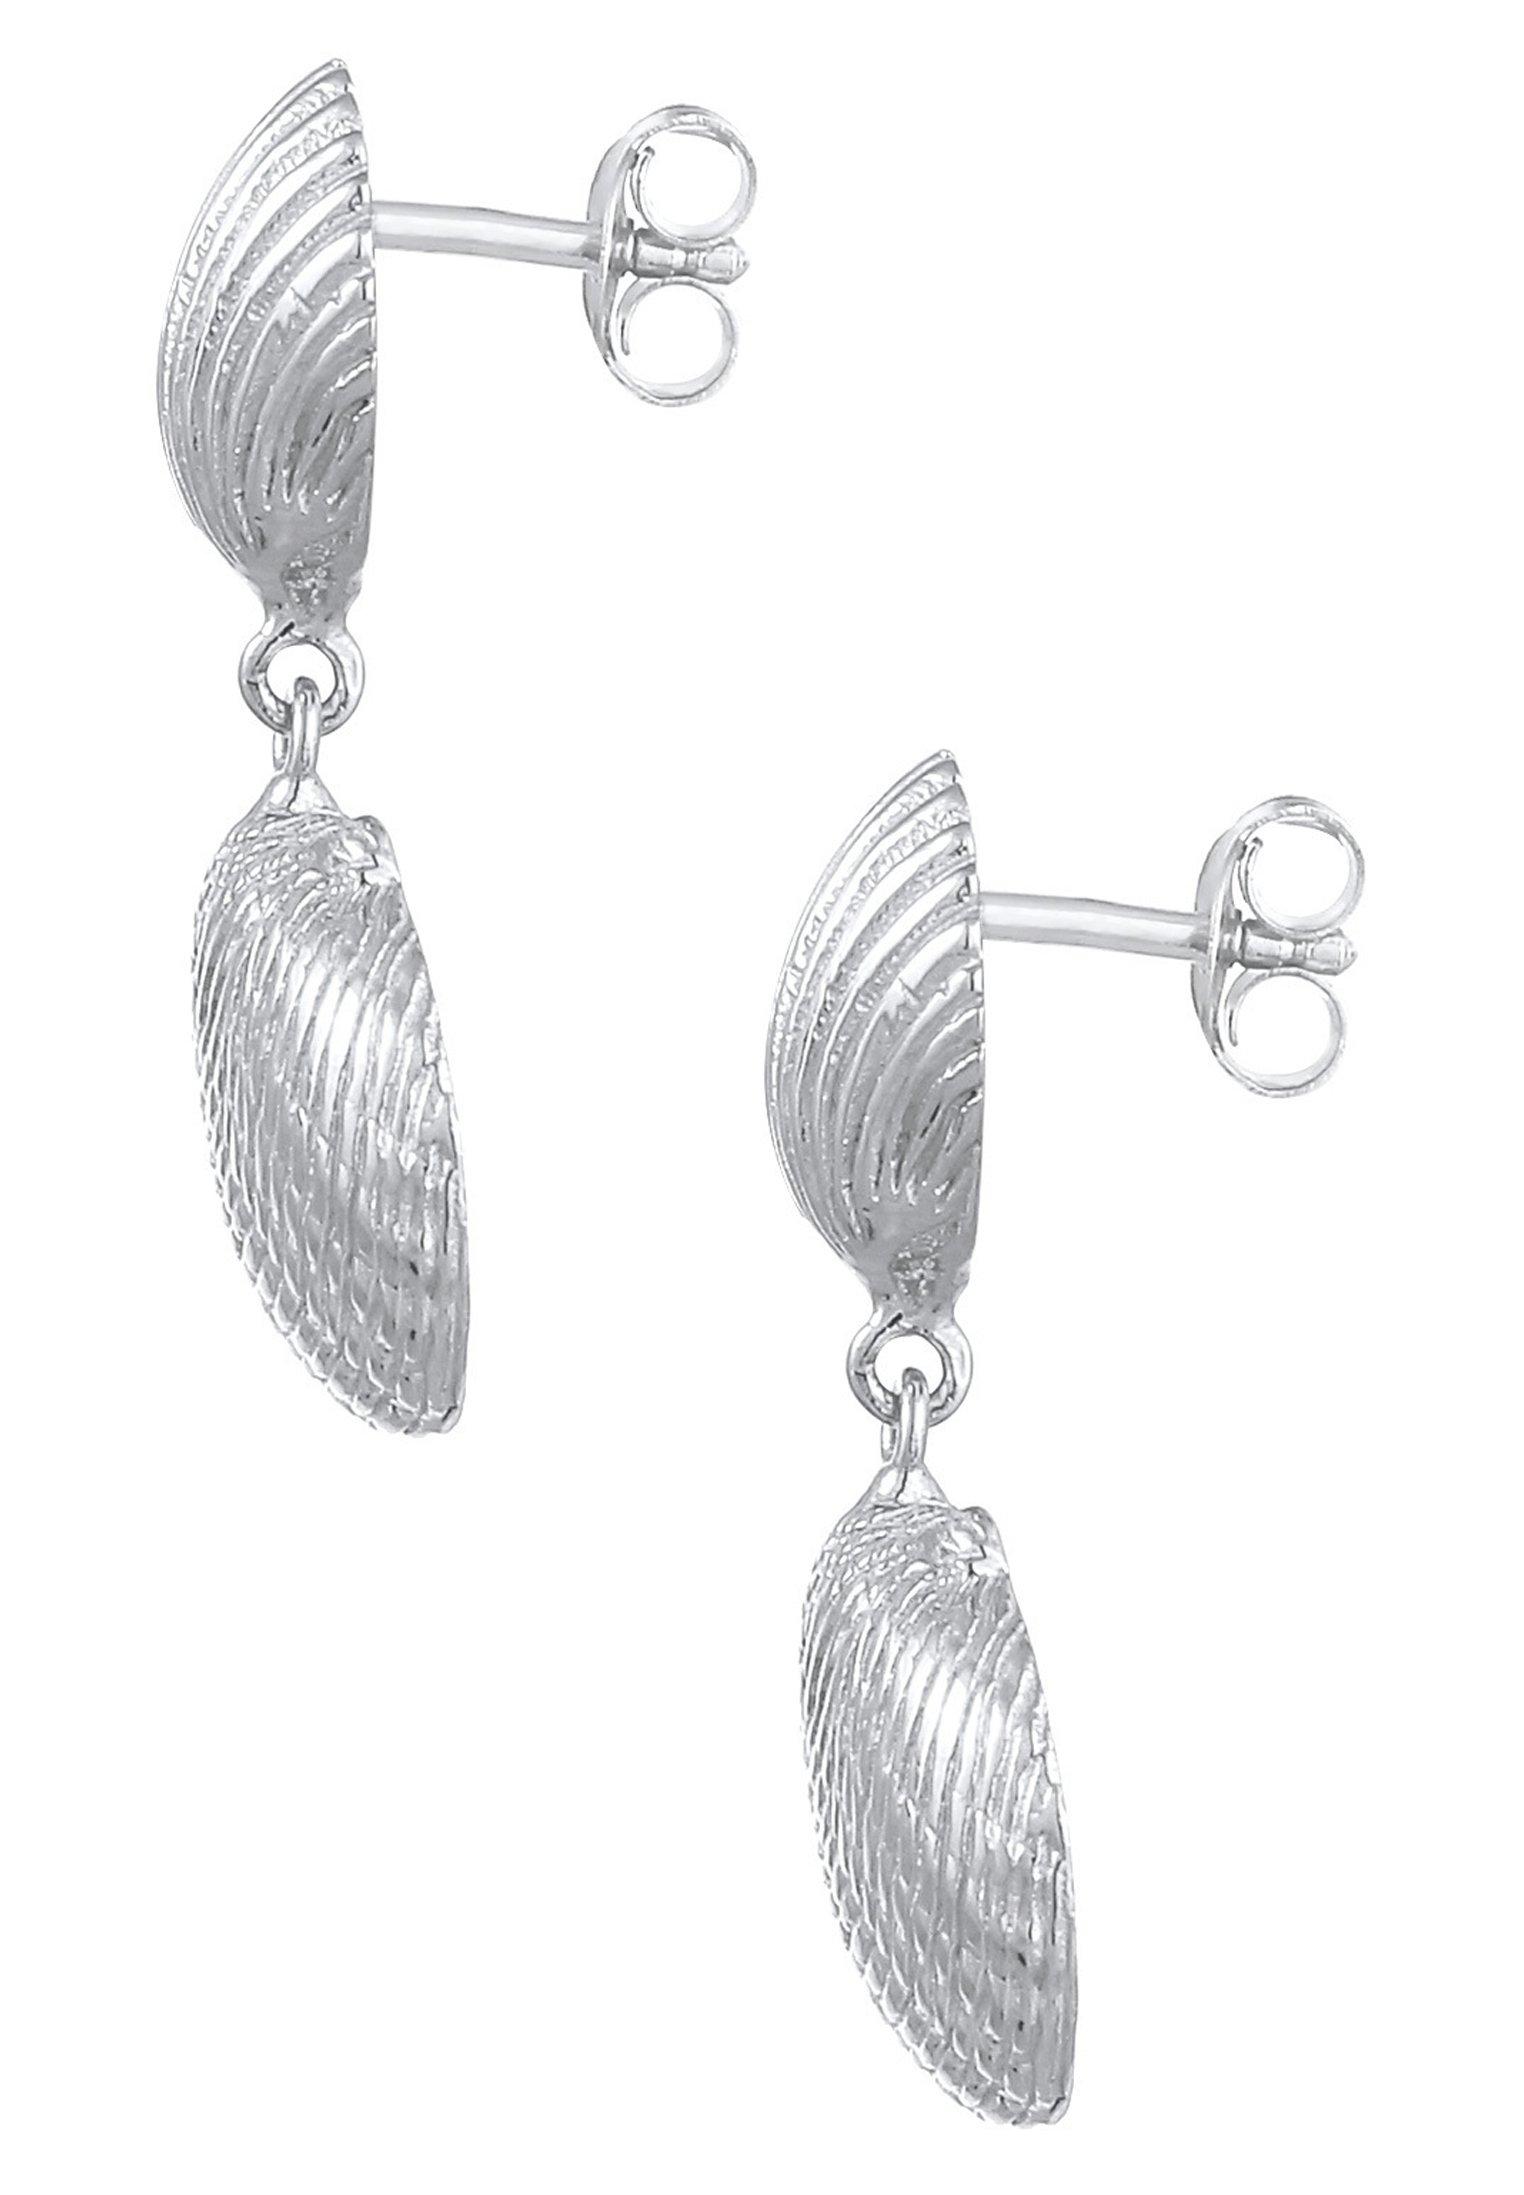 Elli Muschel - Ohrringe Silber